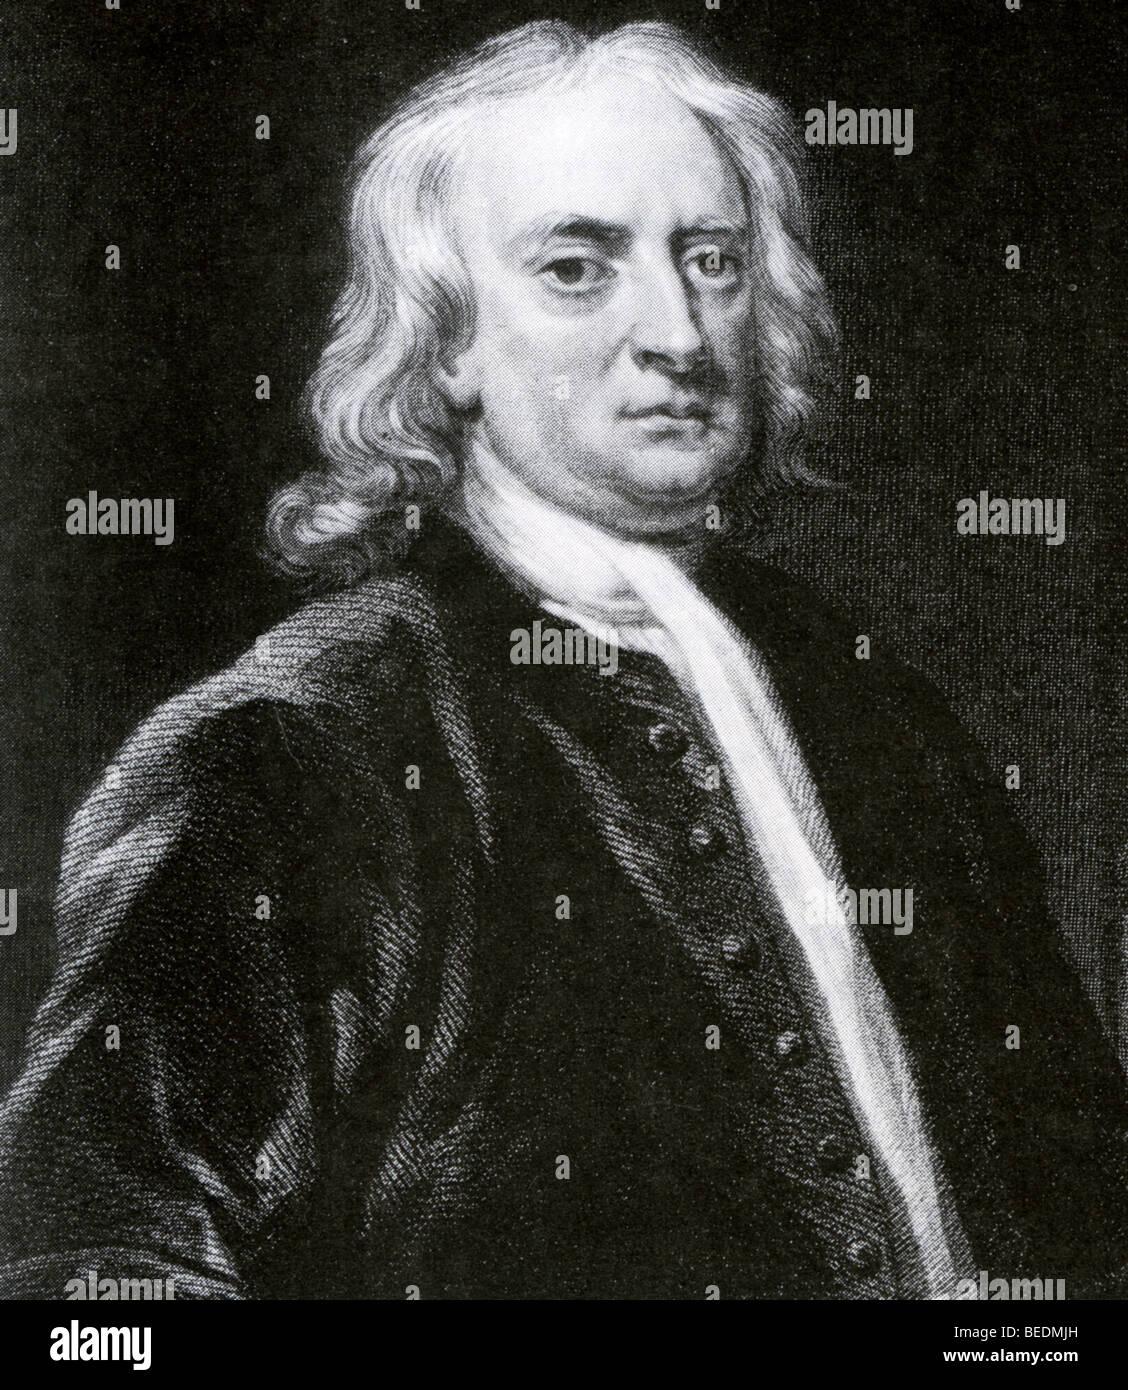 SIR ISAAC NEWTON - English scientist 1643-1727 - Stock Image